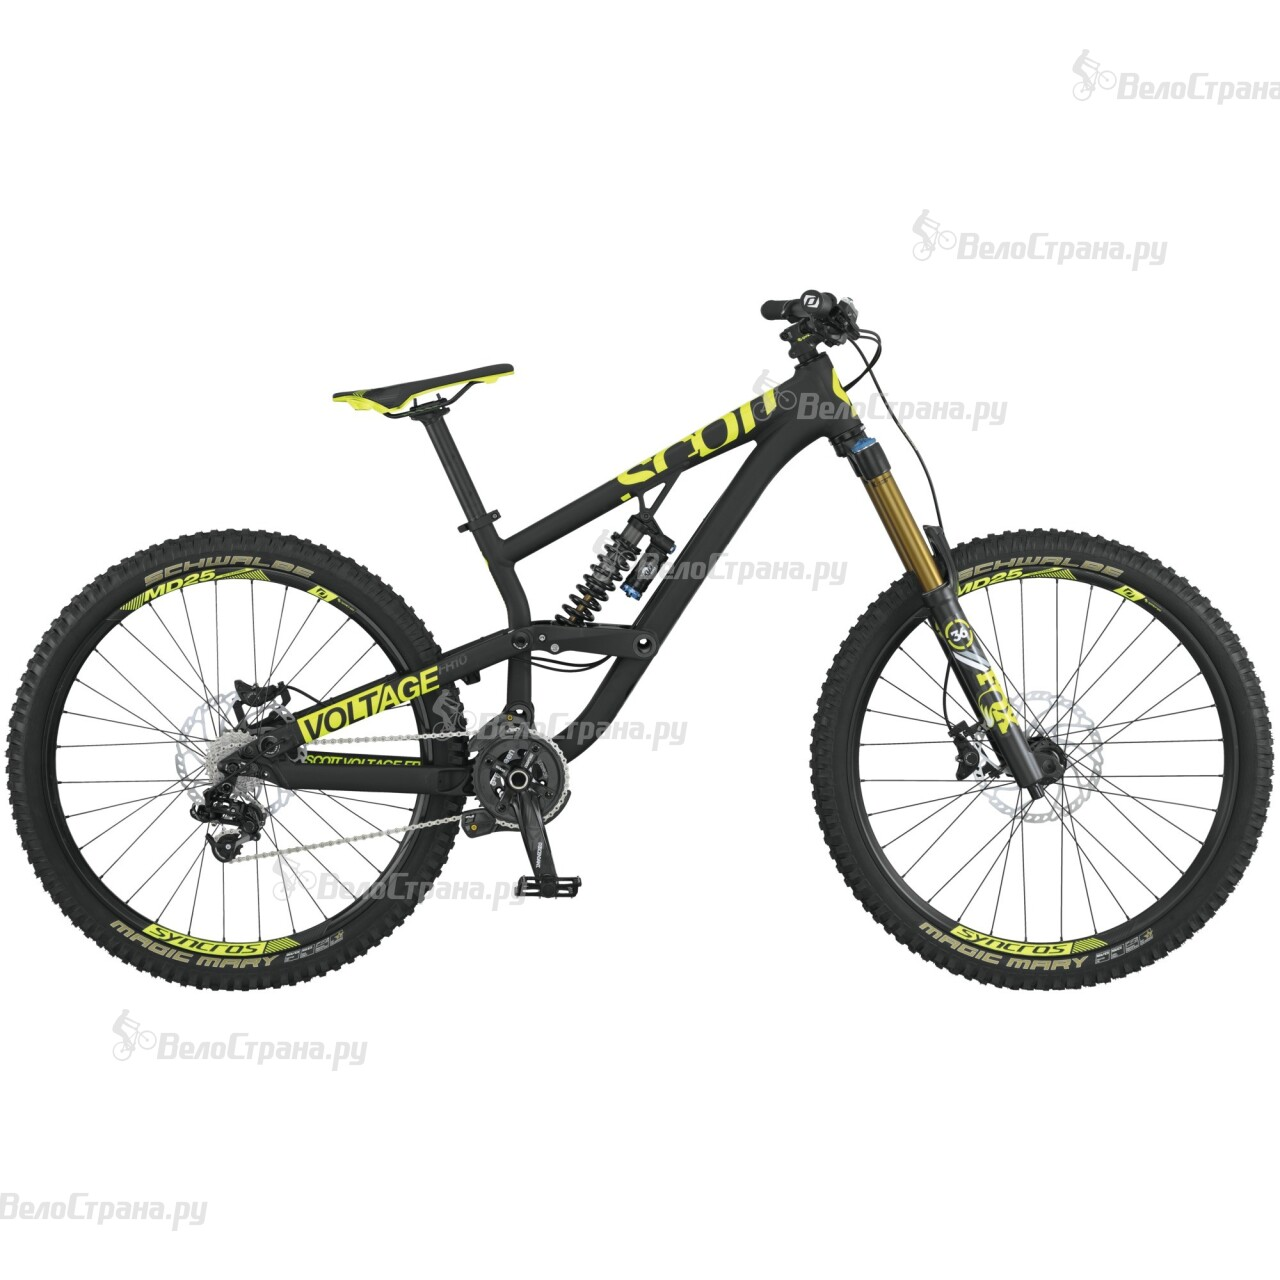 Велосипед Scott Voltage FR 710 (2015)